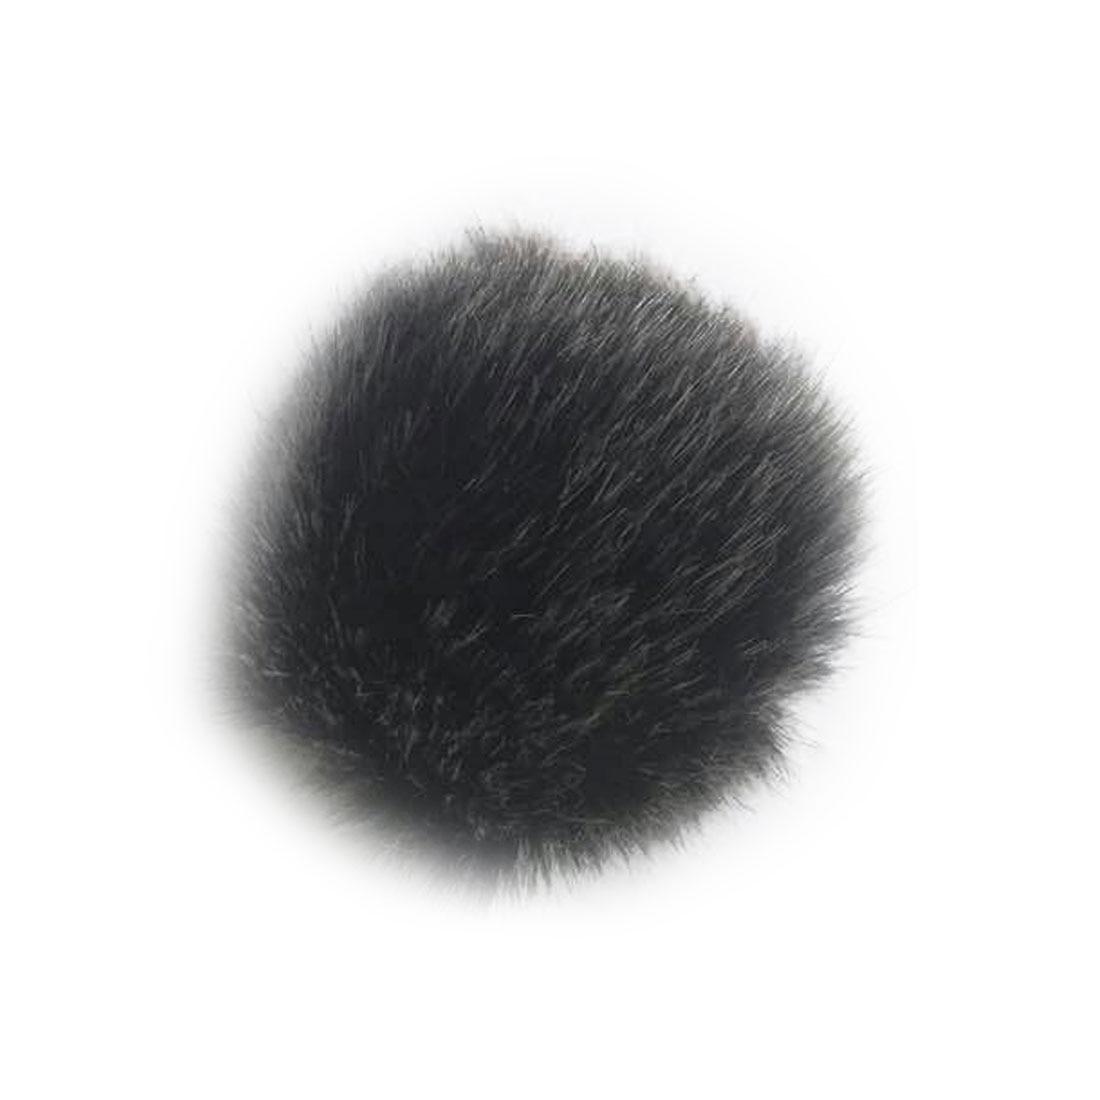 Marsnaska New Black Grey Fur Windscreen Windshield Wind Muff for Lapel Microphone Mic